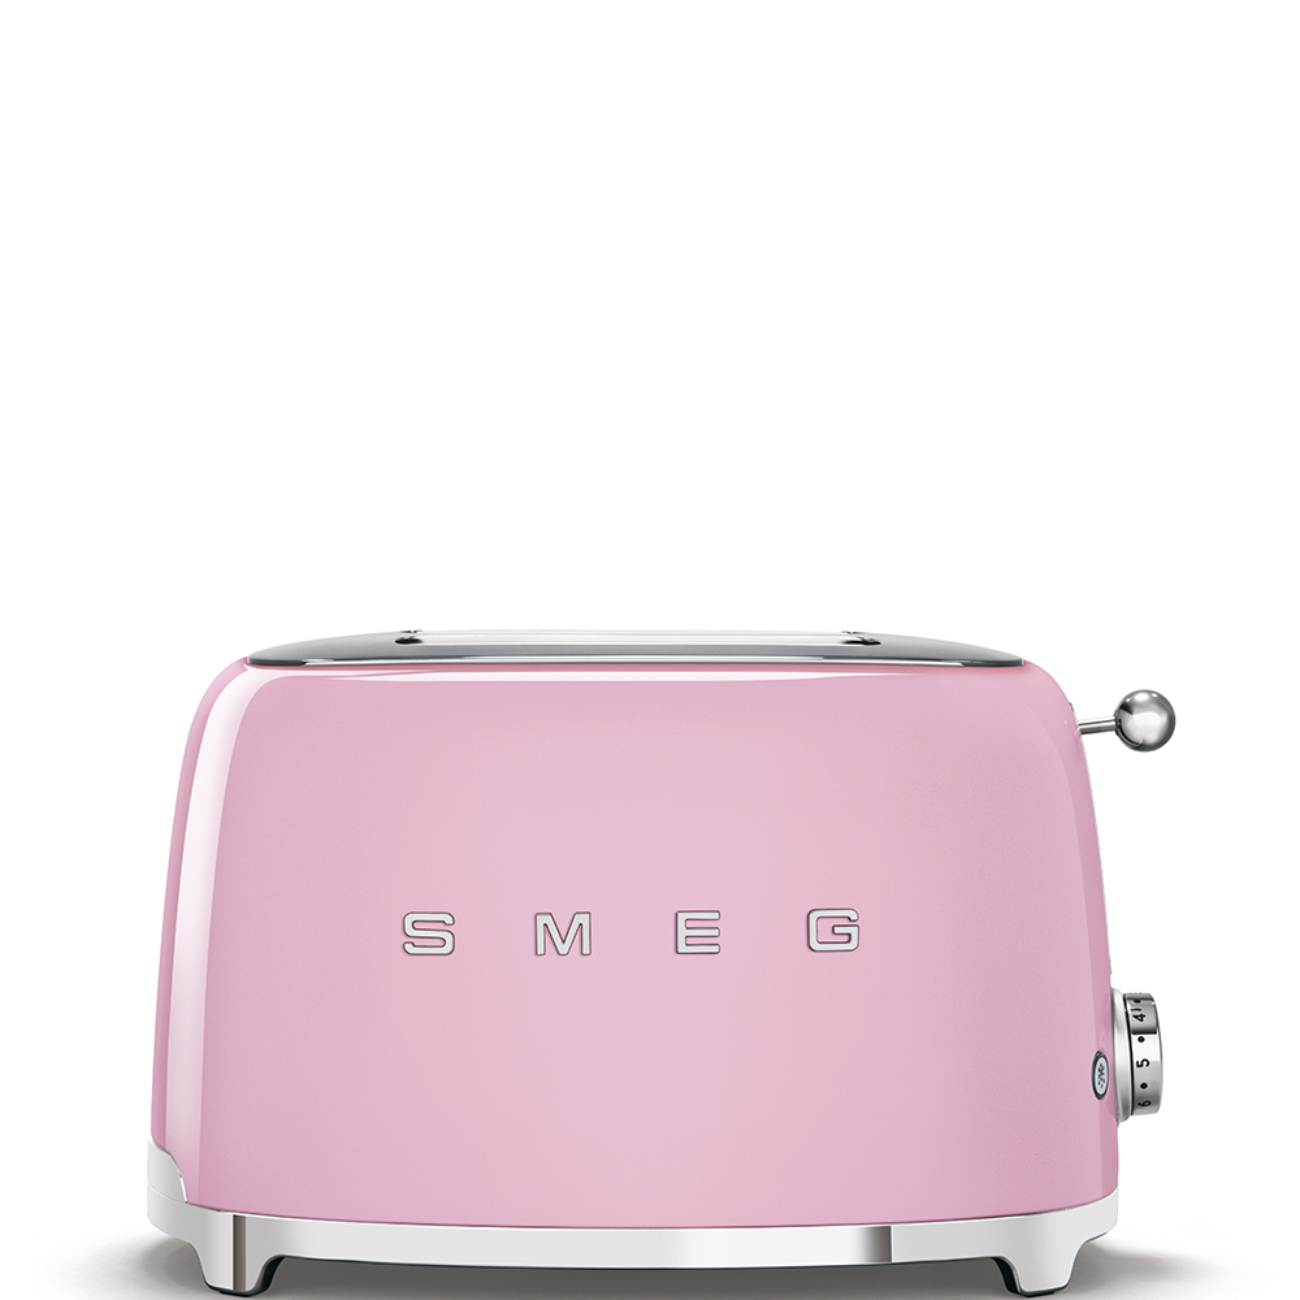 toasters rose Smeg